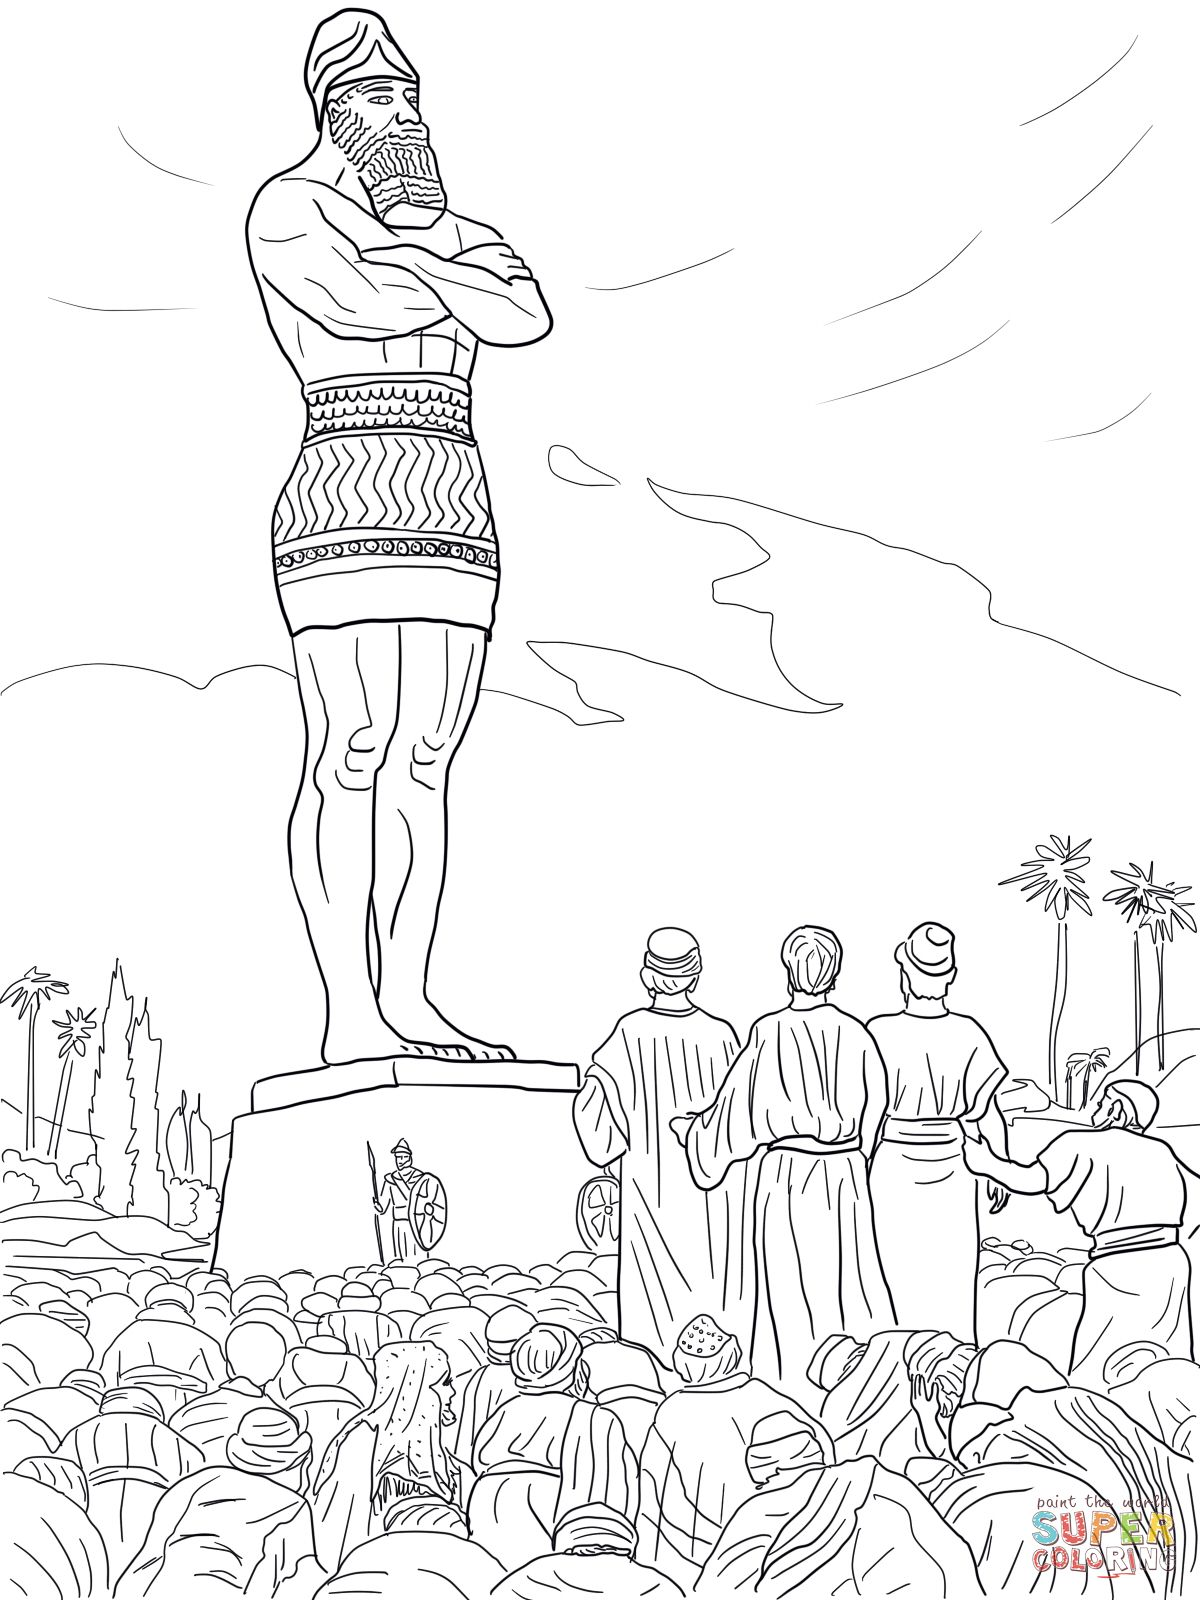 daniel's friends refused to worship the statue  super